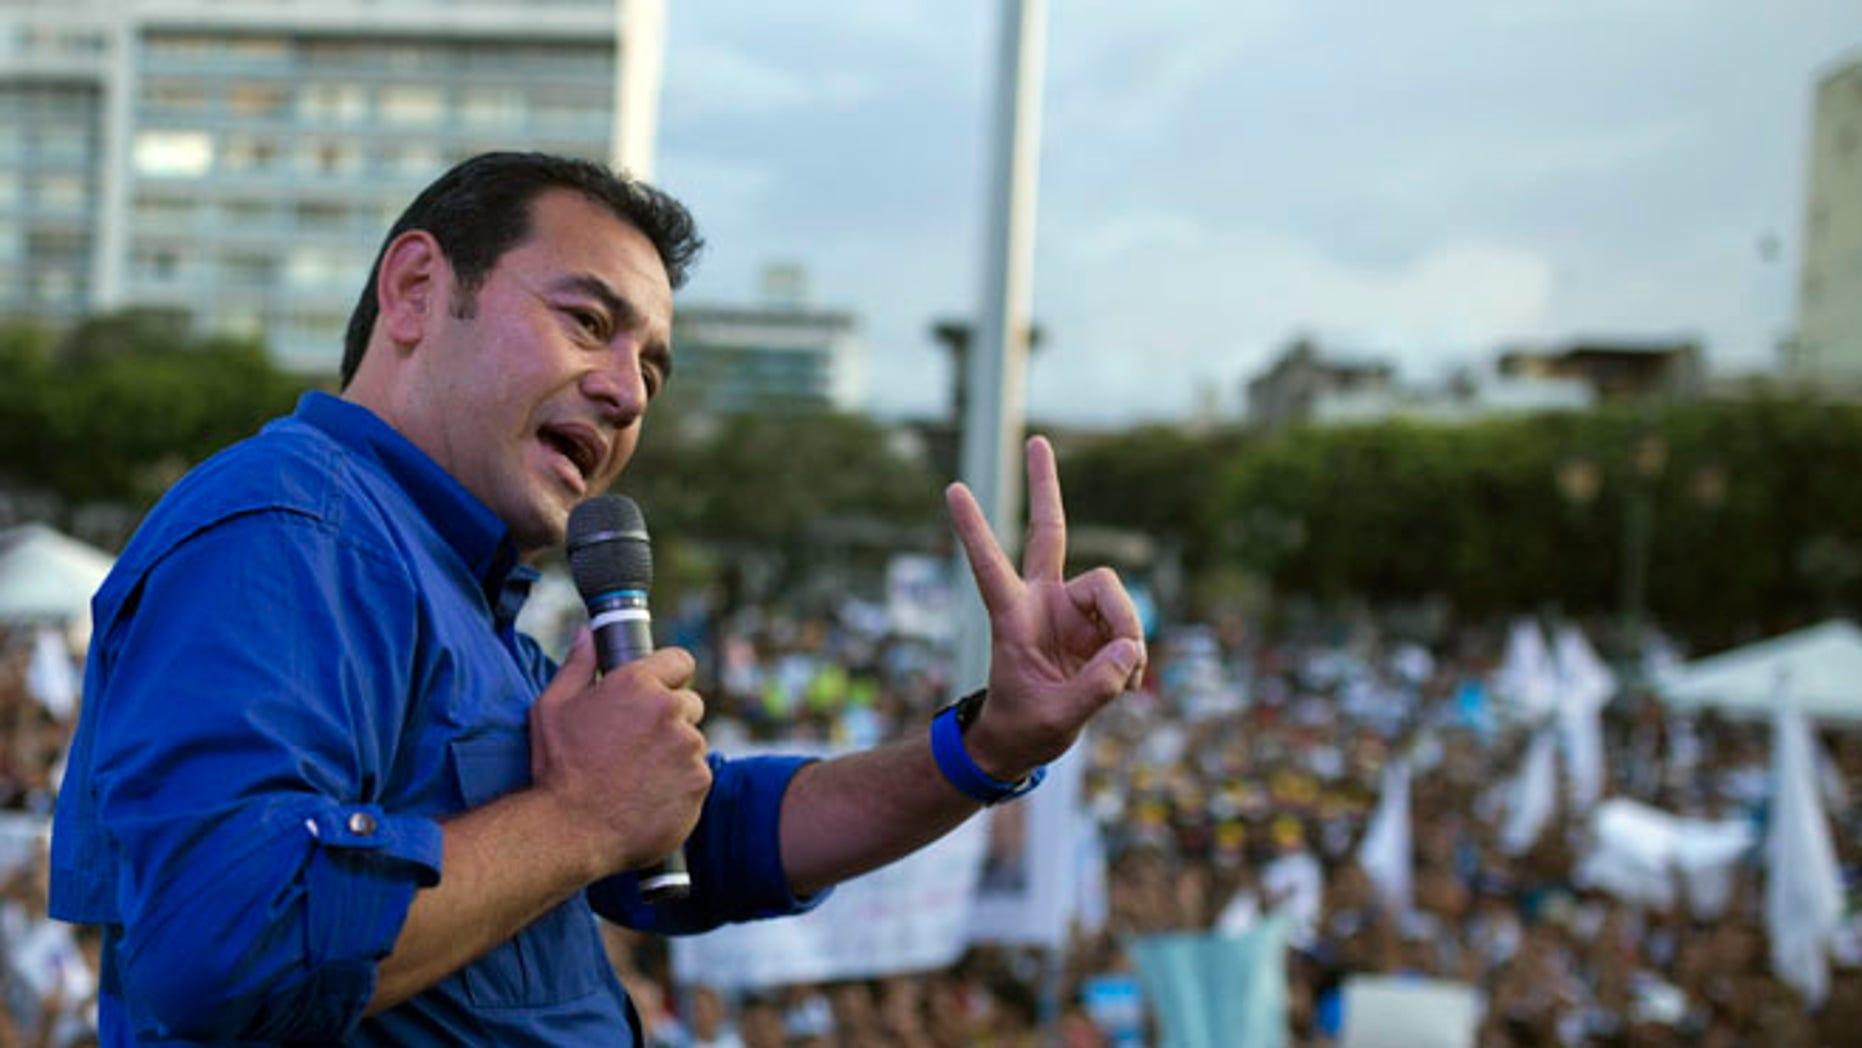 Jimmy Morales, the president of Guatemala. (AP Photo/Luis Soto)